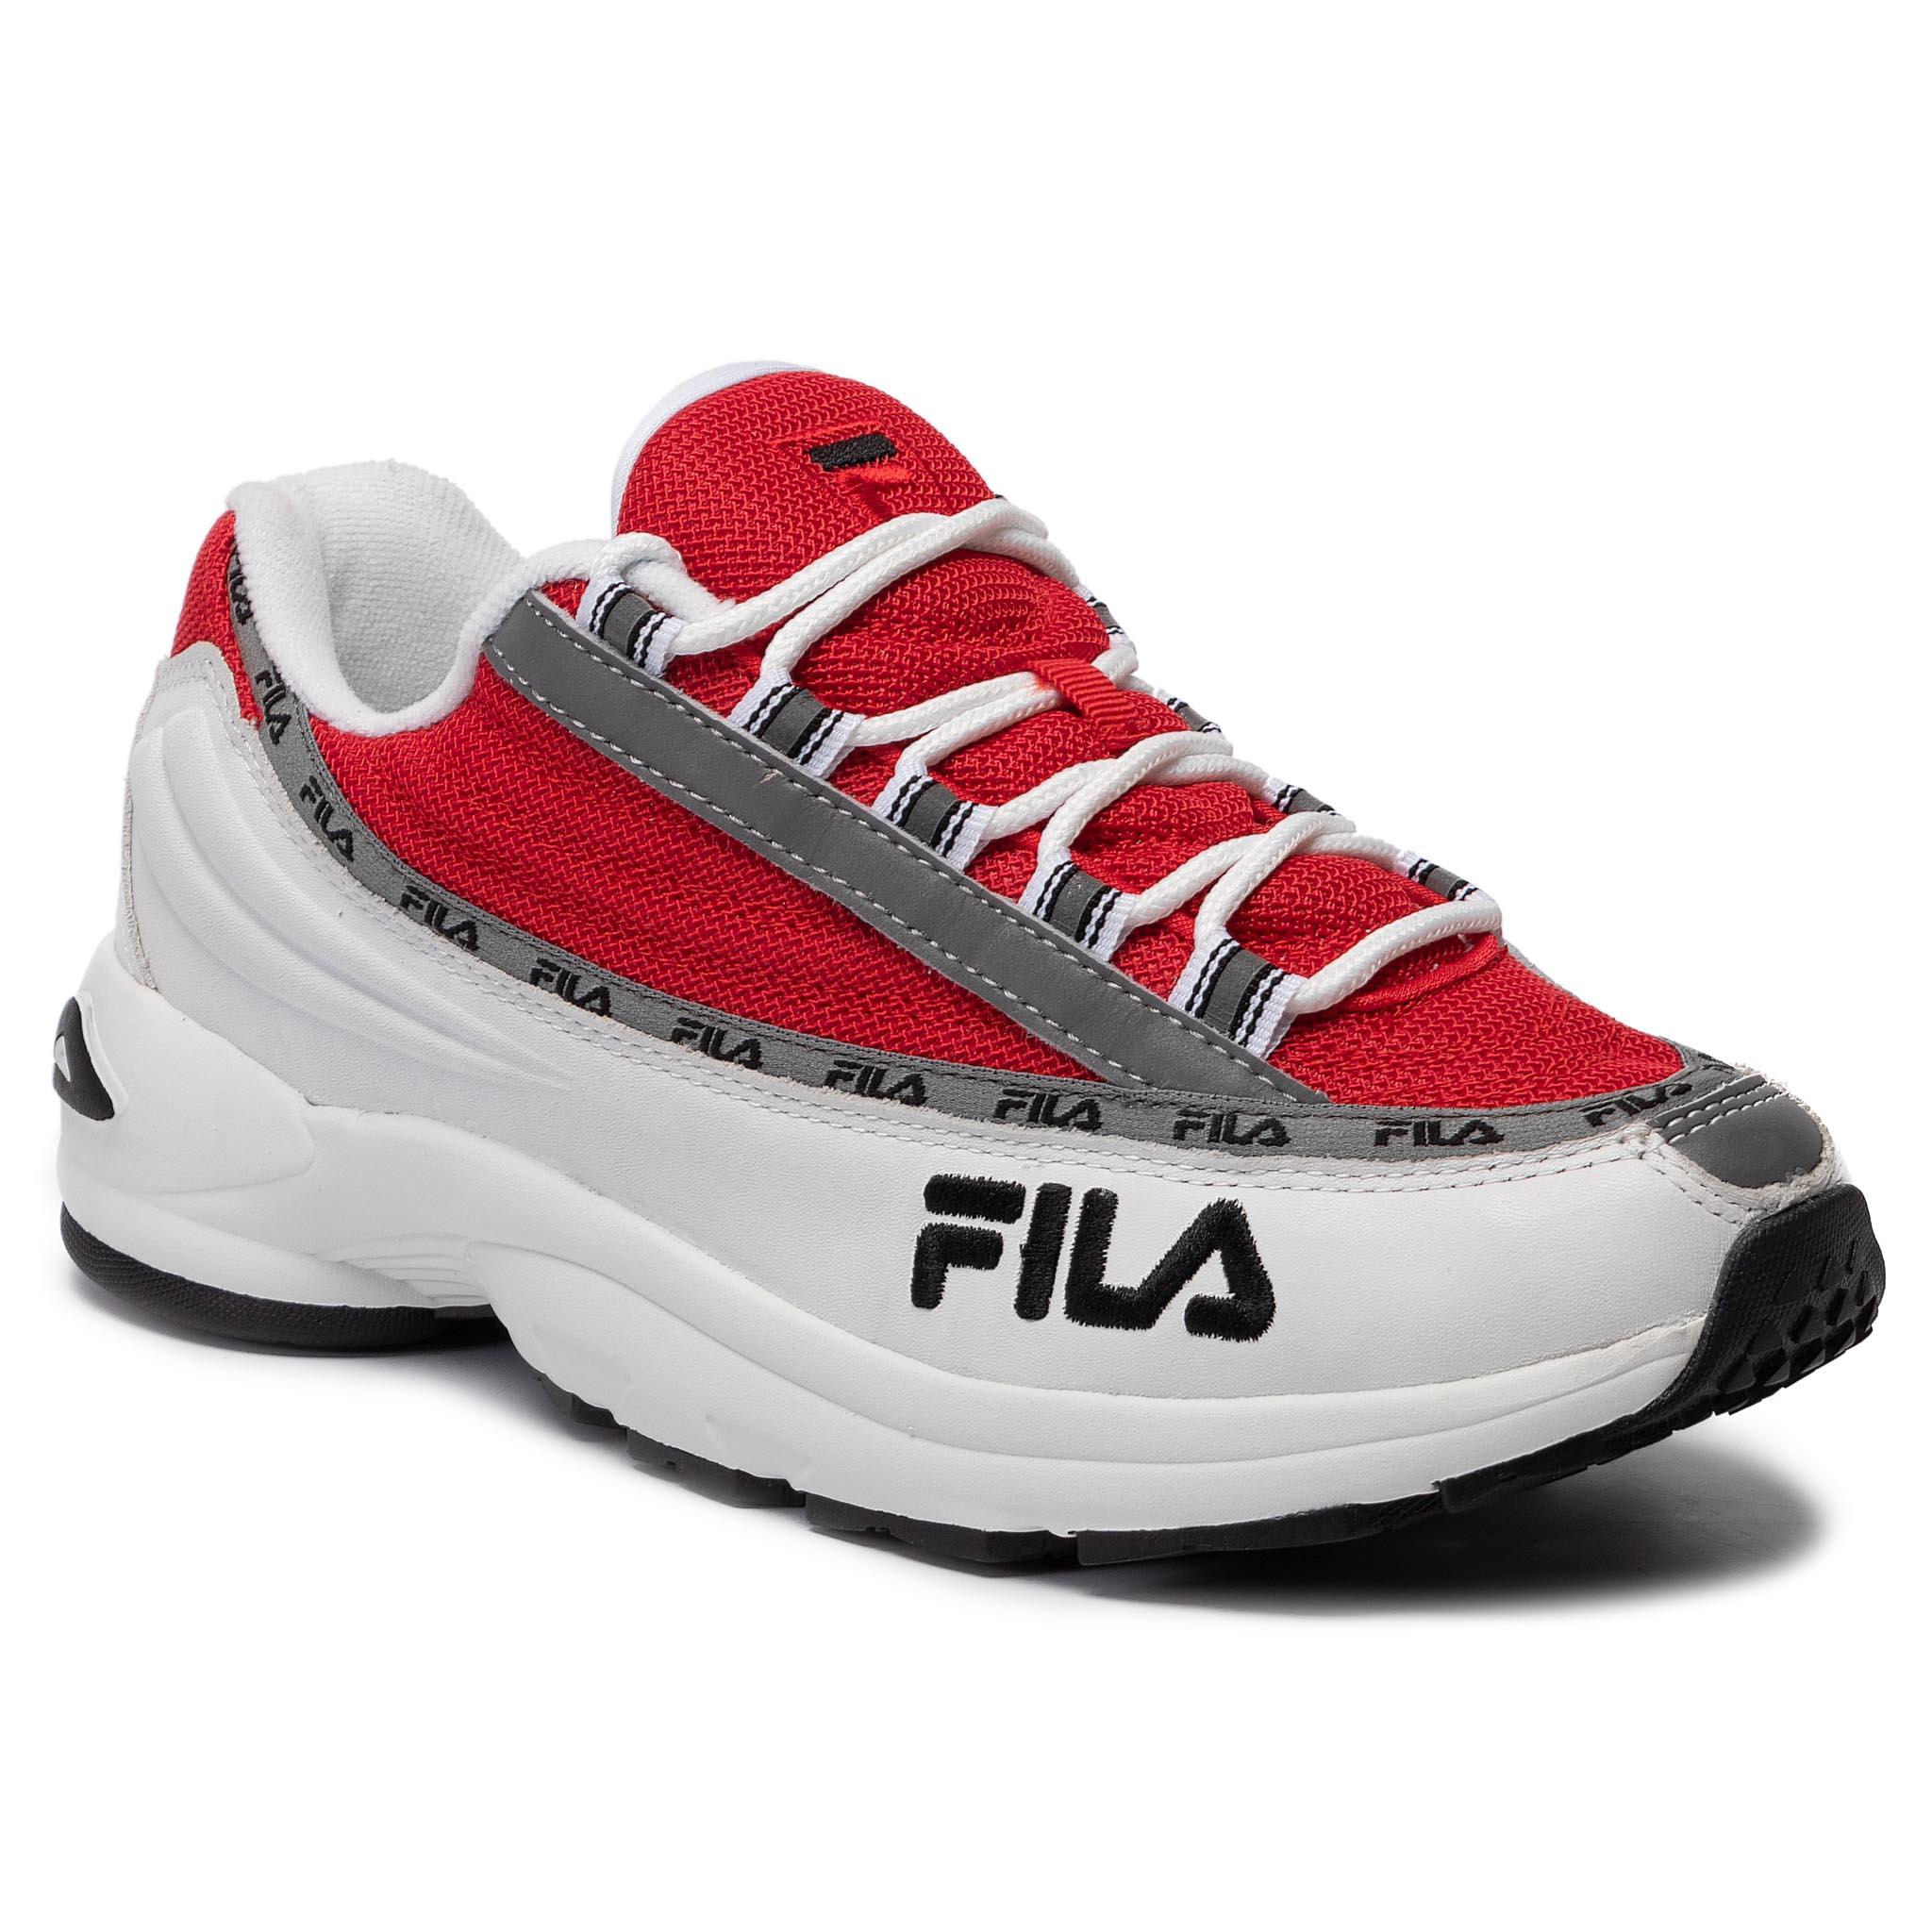 Sneakers FILA Dstr97 1010597.02A WhiteFila Red Sneakers